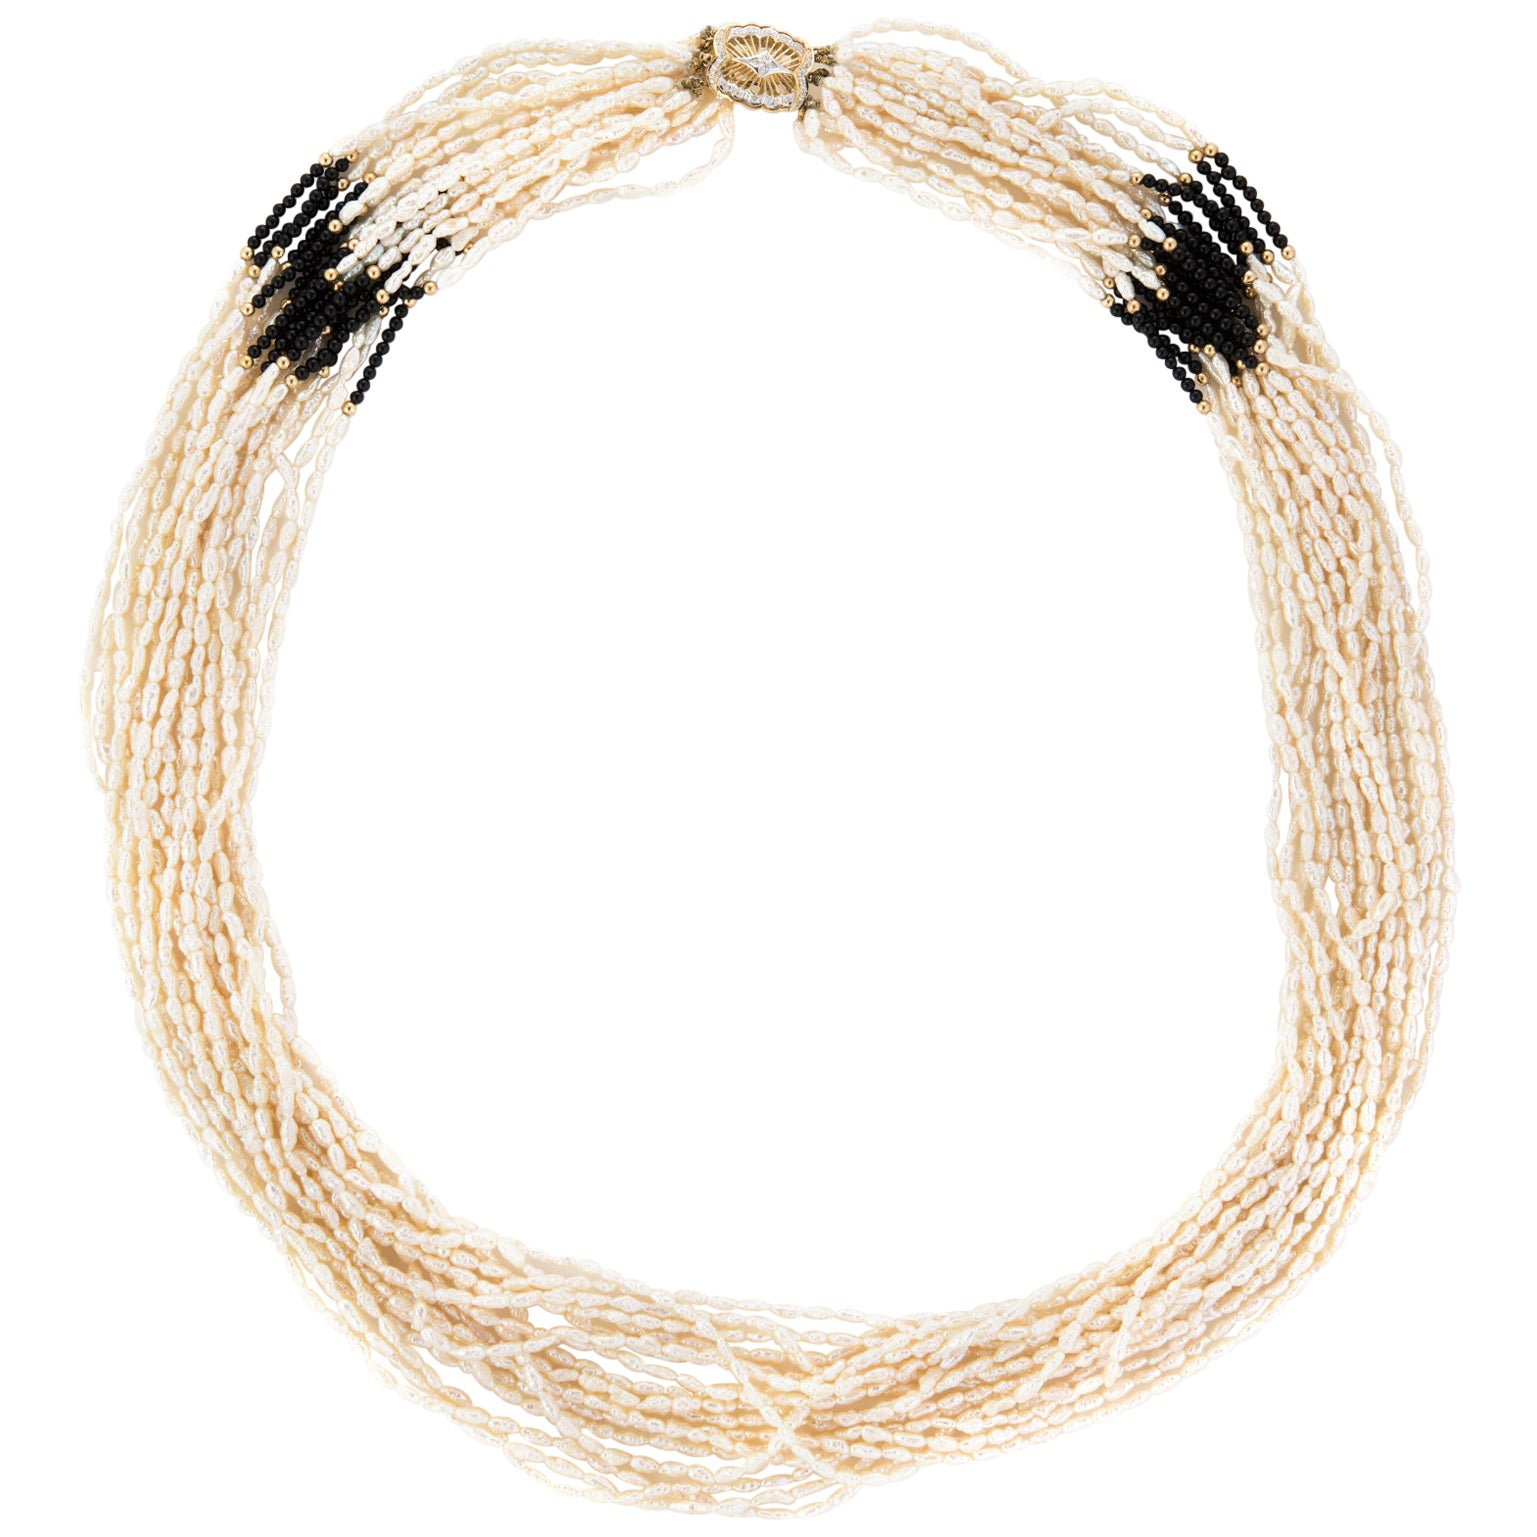 Multi 18 Strand Necklace Freshwater Pearls Onyx Long 14 Karat Gold Vintage